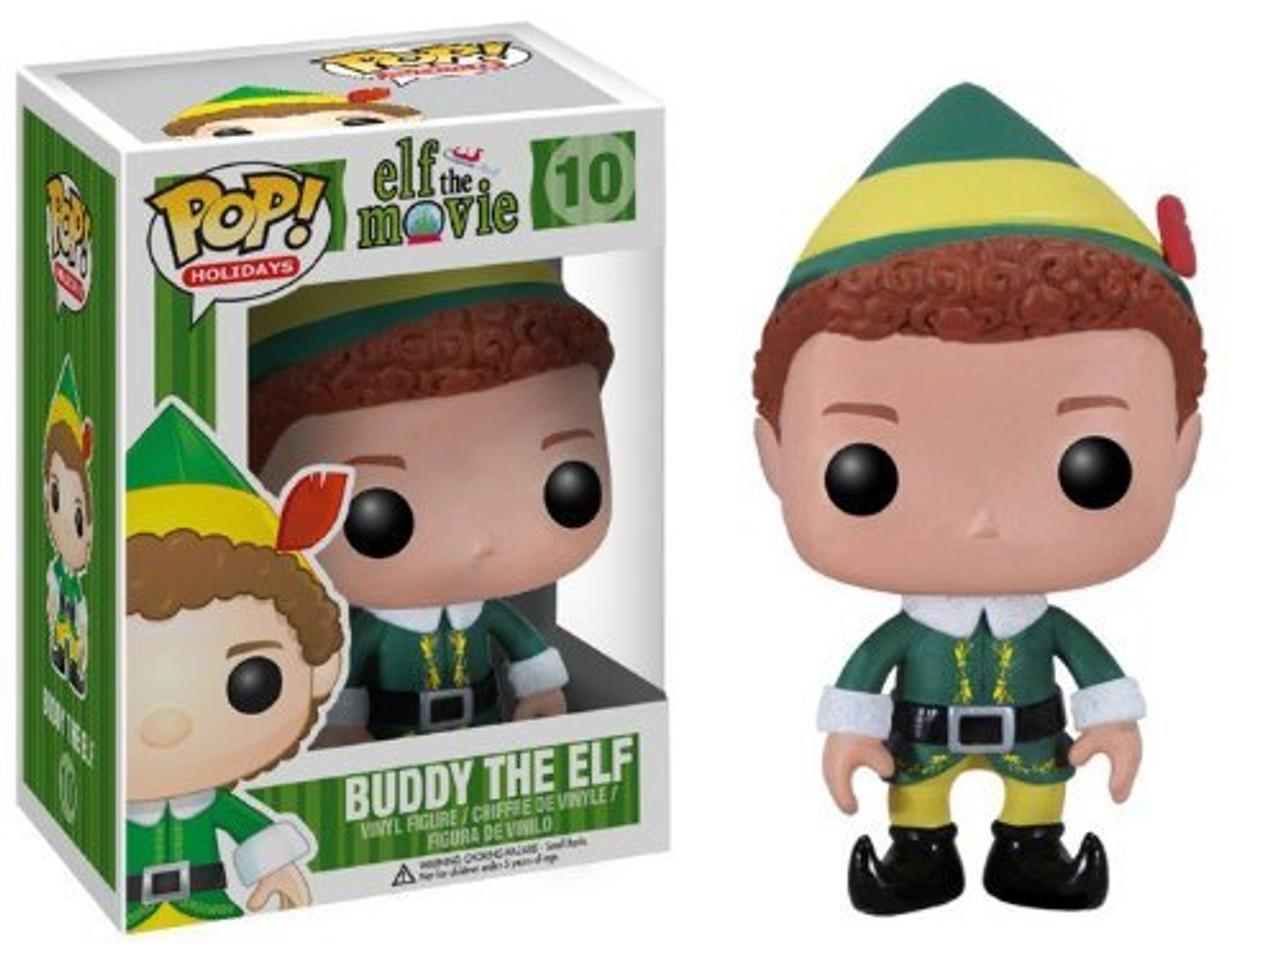 Elf the Movie Funko POP! Holidays Buddy the Elf Vinyl Figure #10